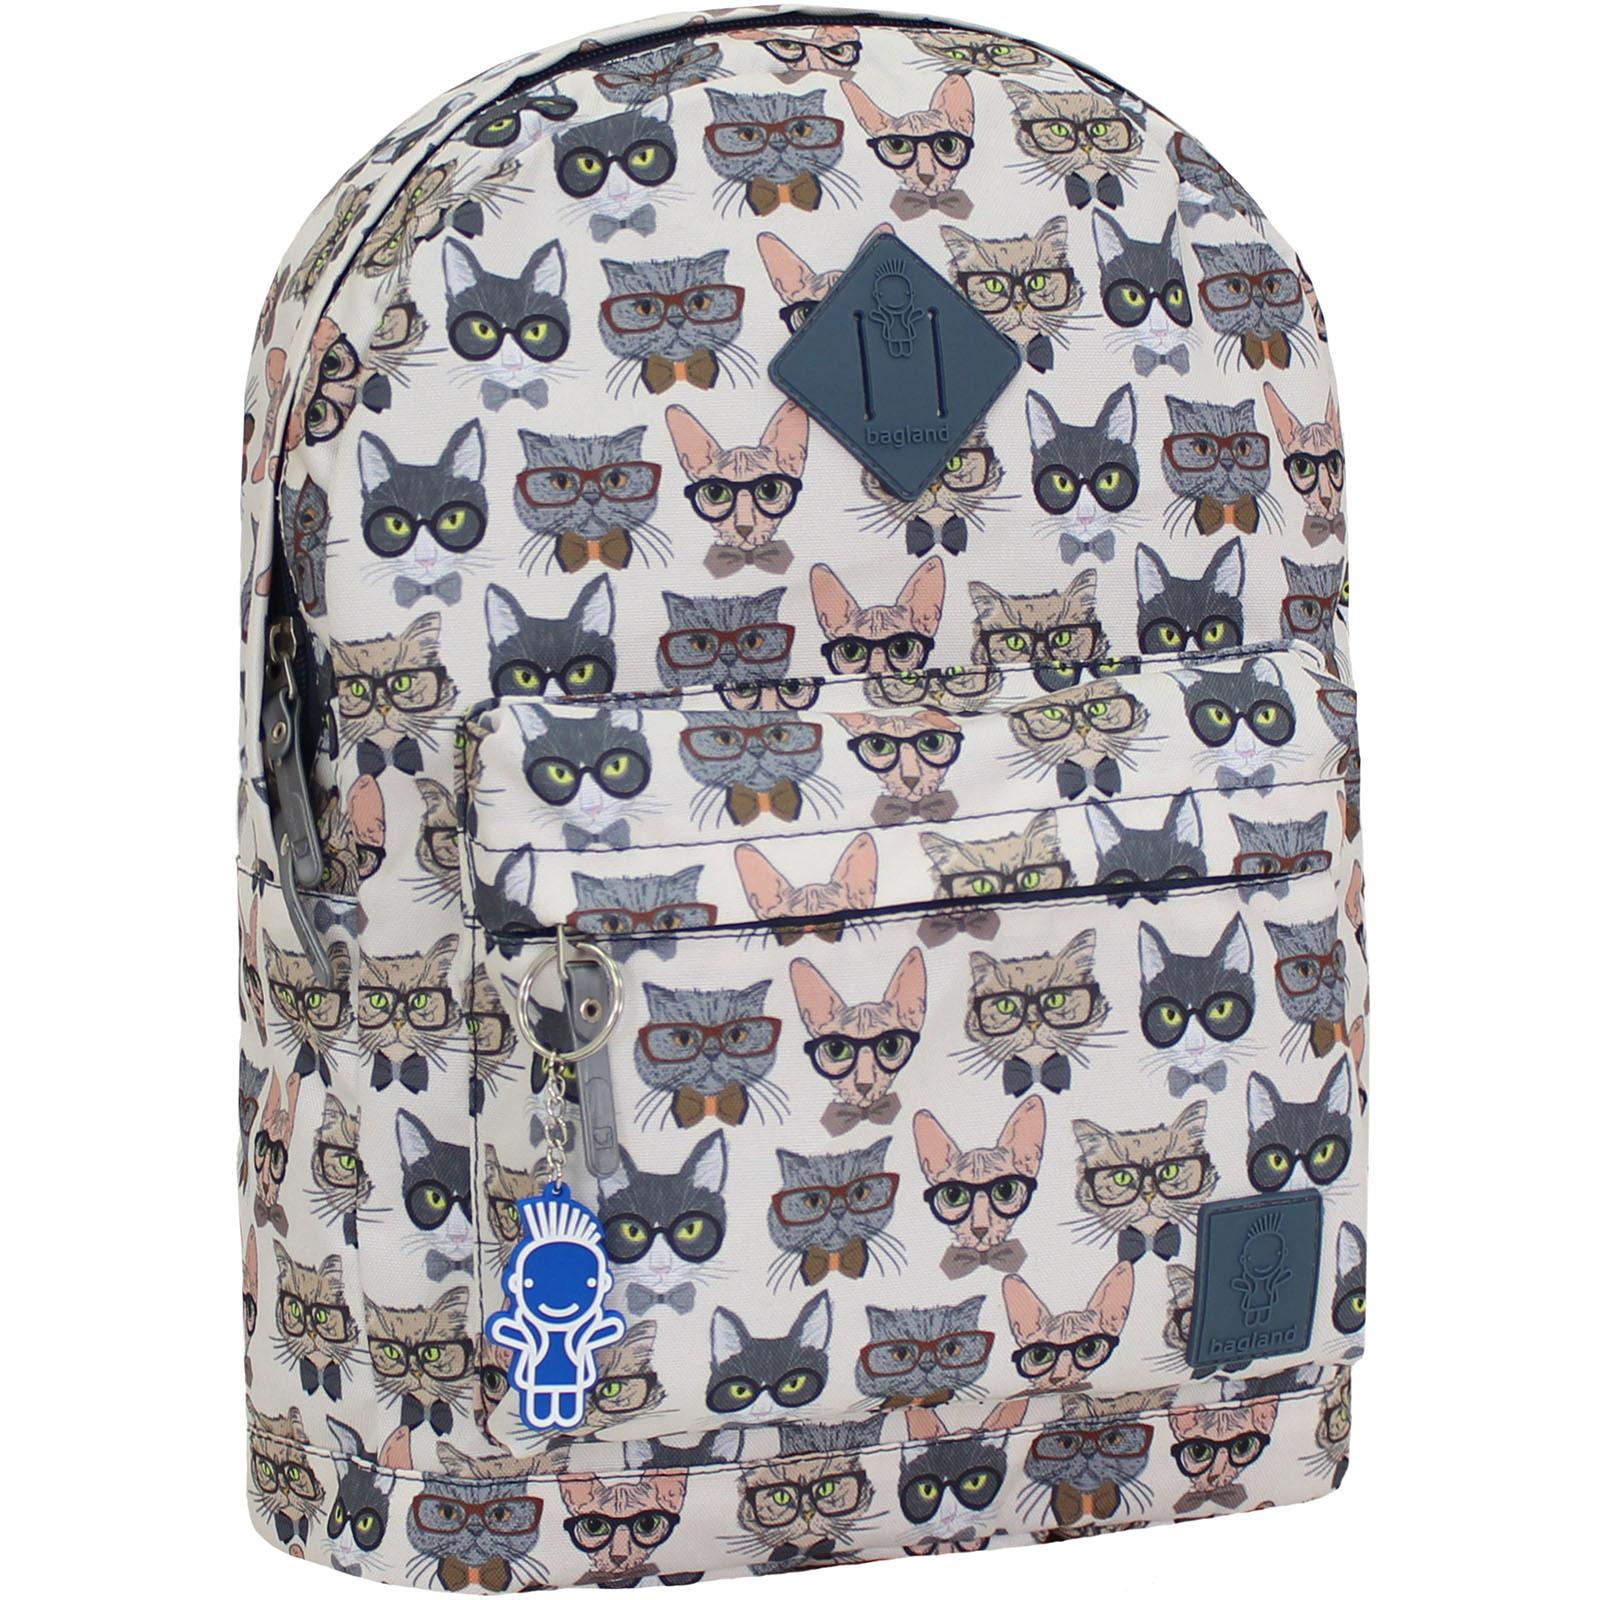 Городские рюкзаки Рюкзак Bagland Молодежный (дизайн) 17 л. сублимация (28) (00533664) IMG_8786.JPG